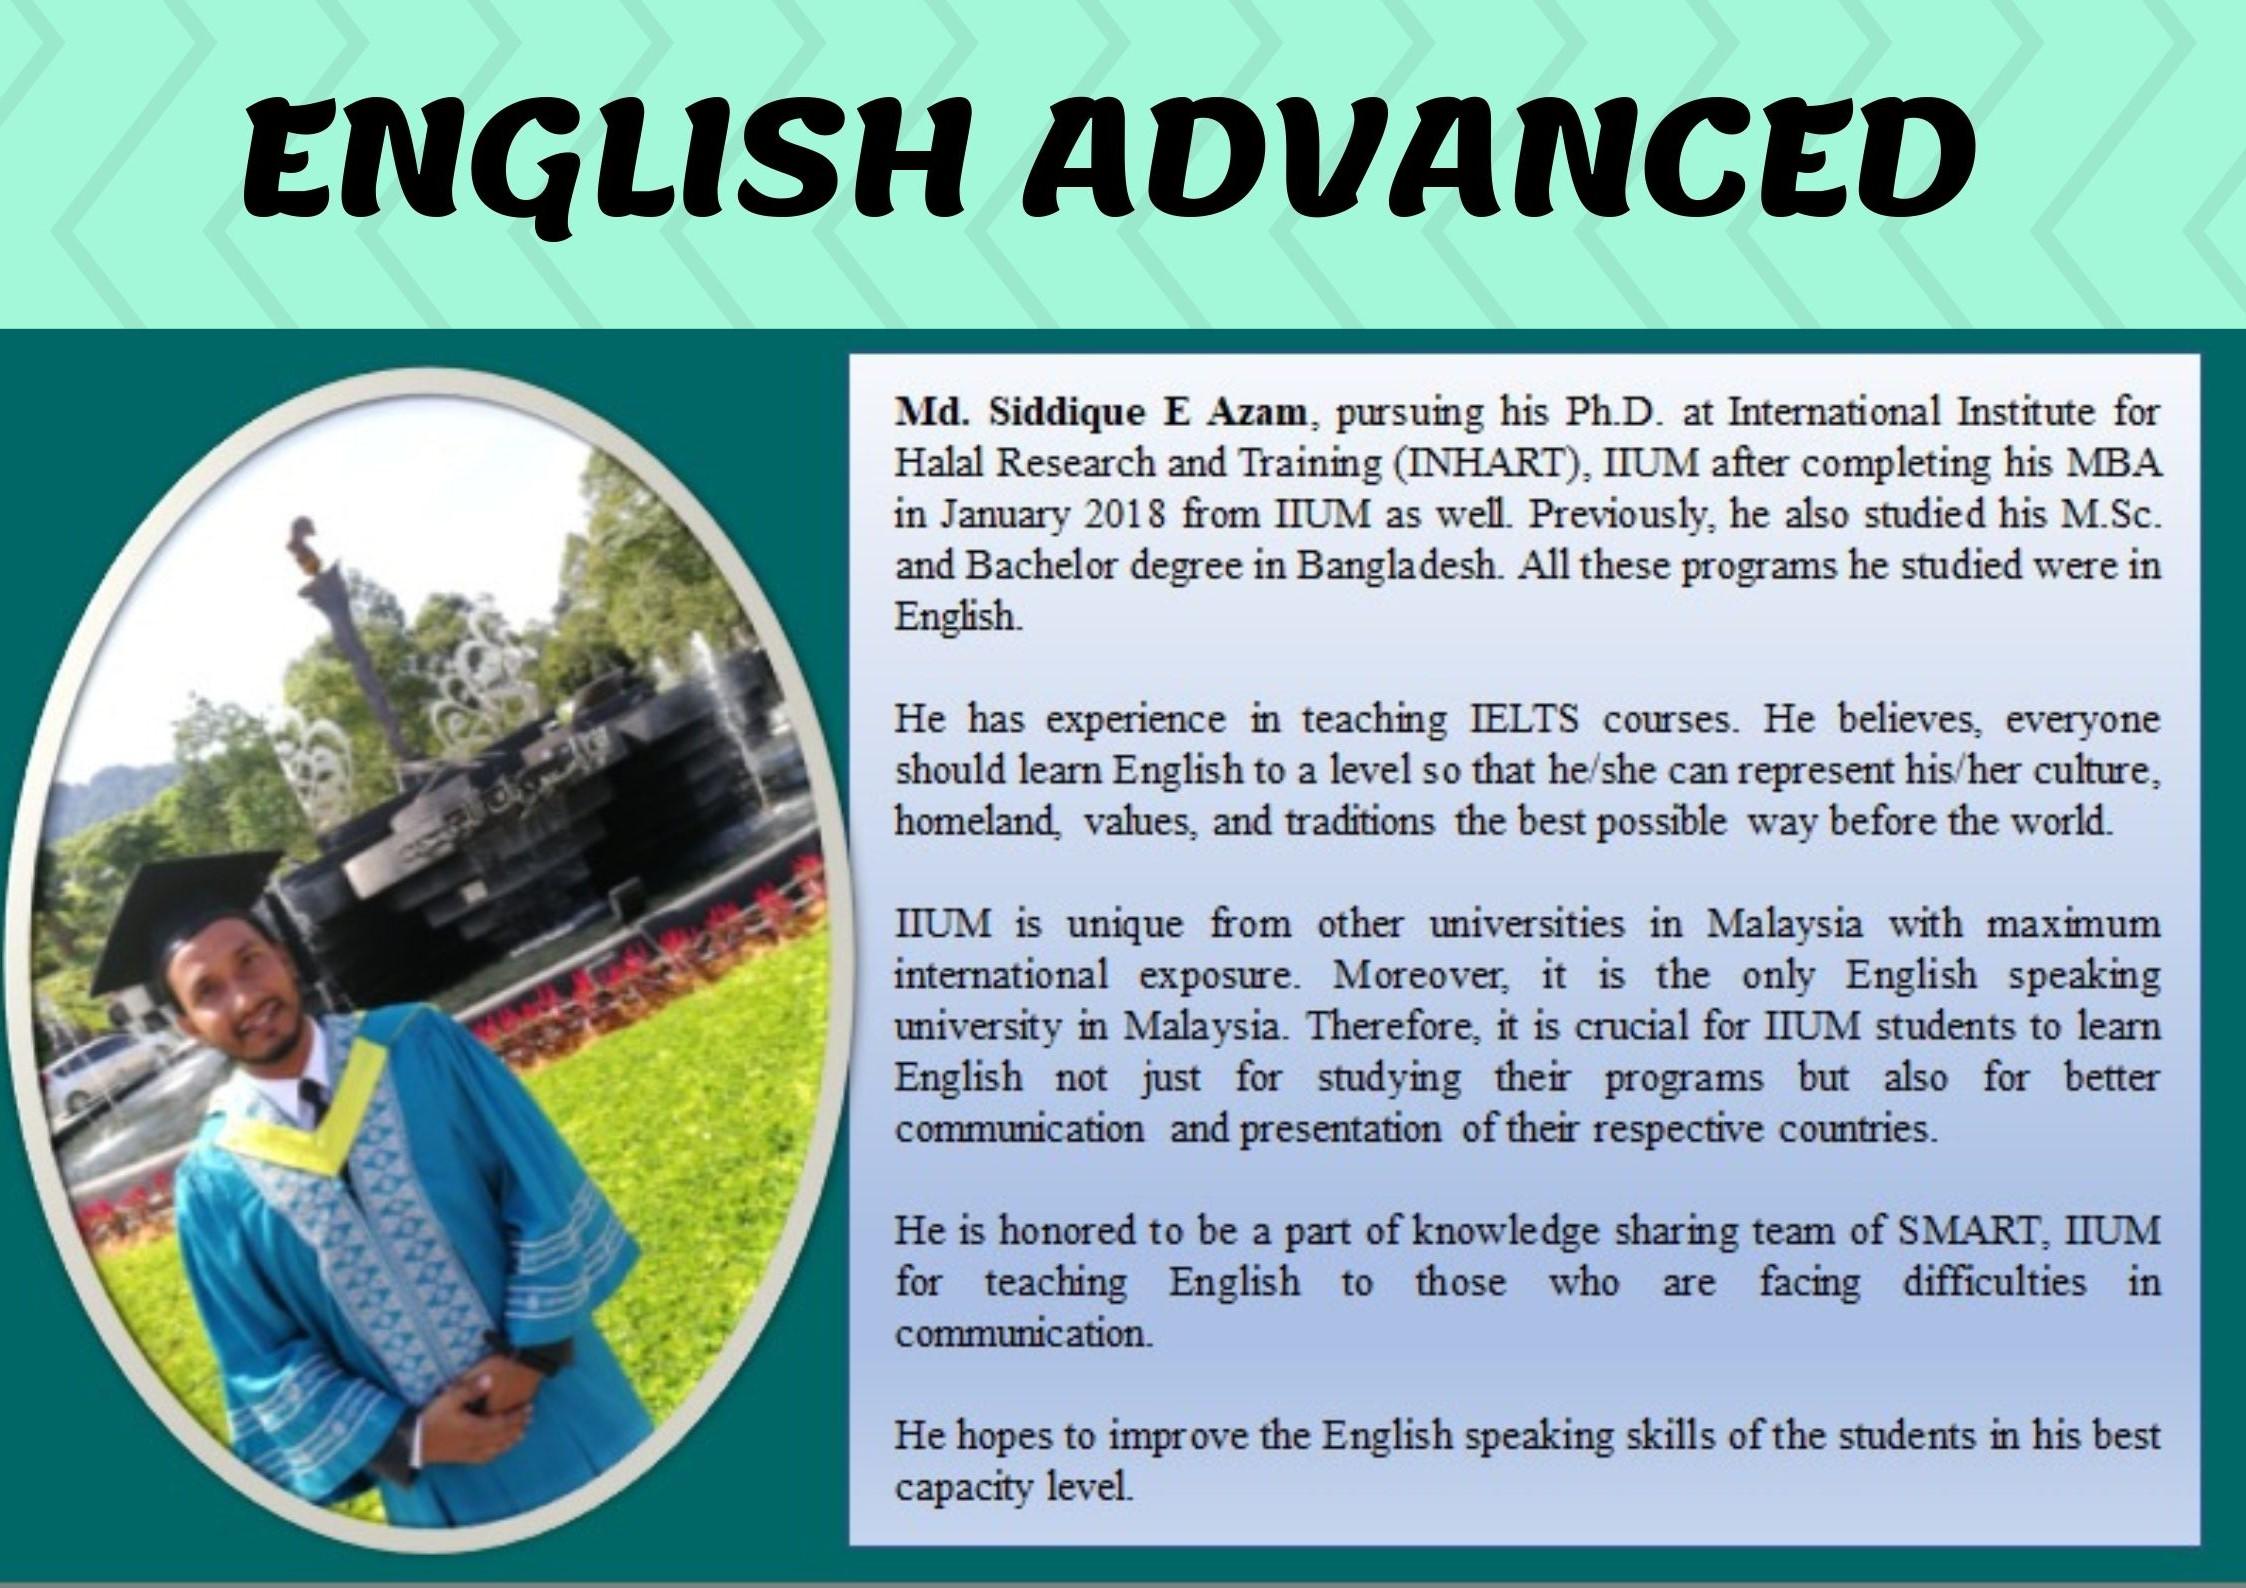 TUTOR PROFILE SEM 3, 2018/2019 : ENGLISH ADVANCED